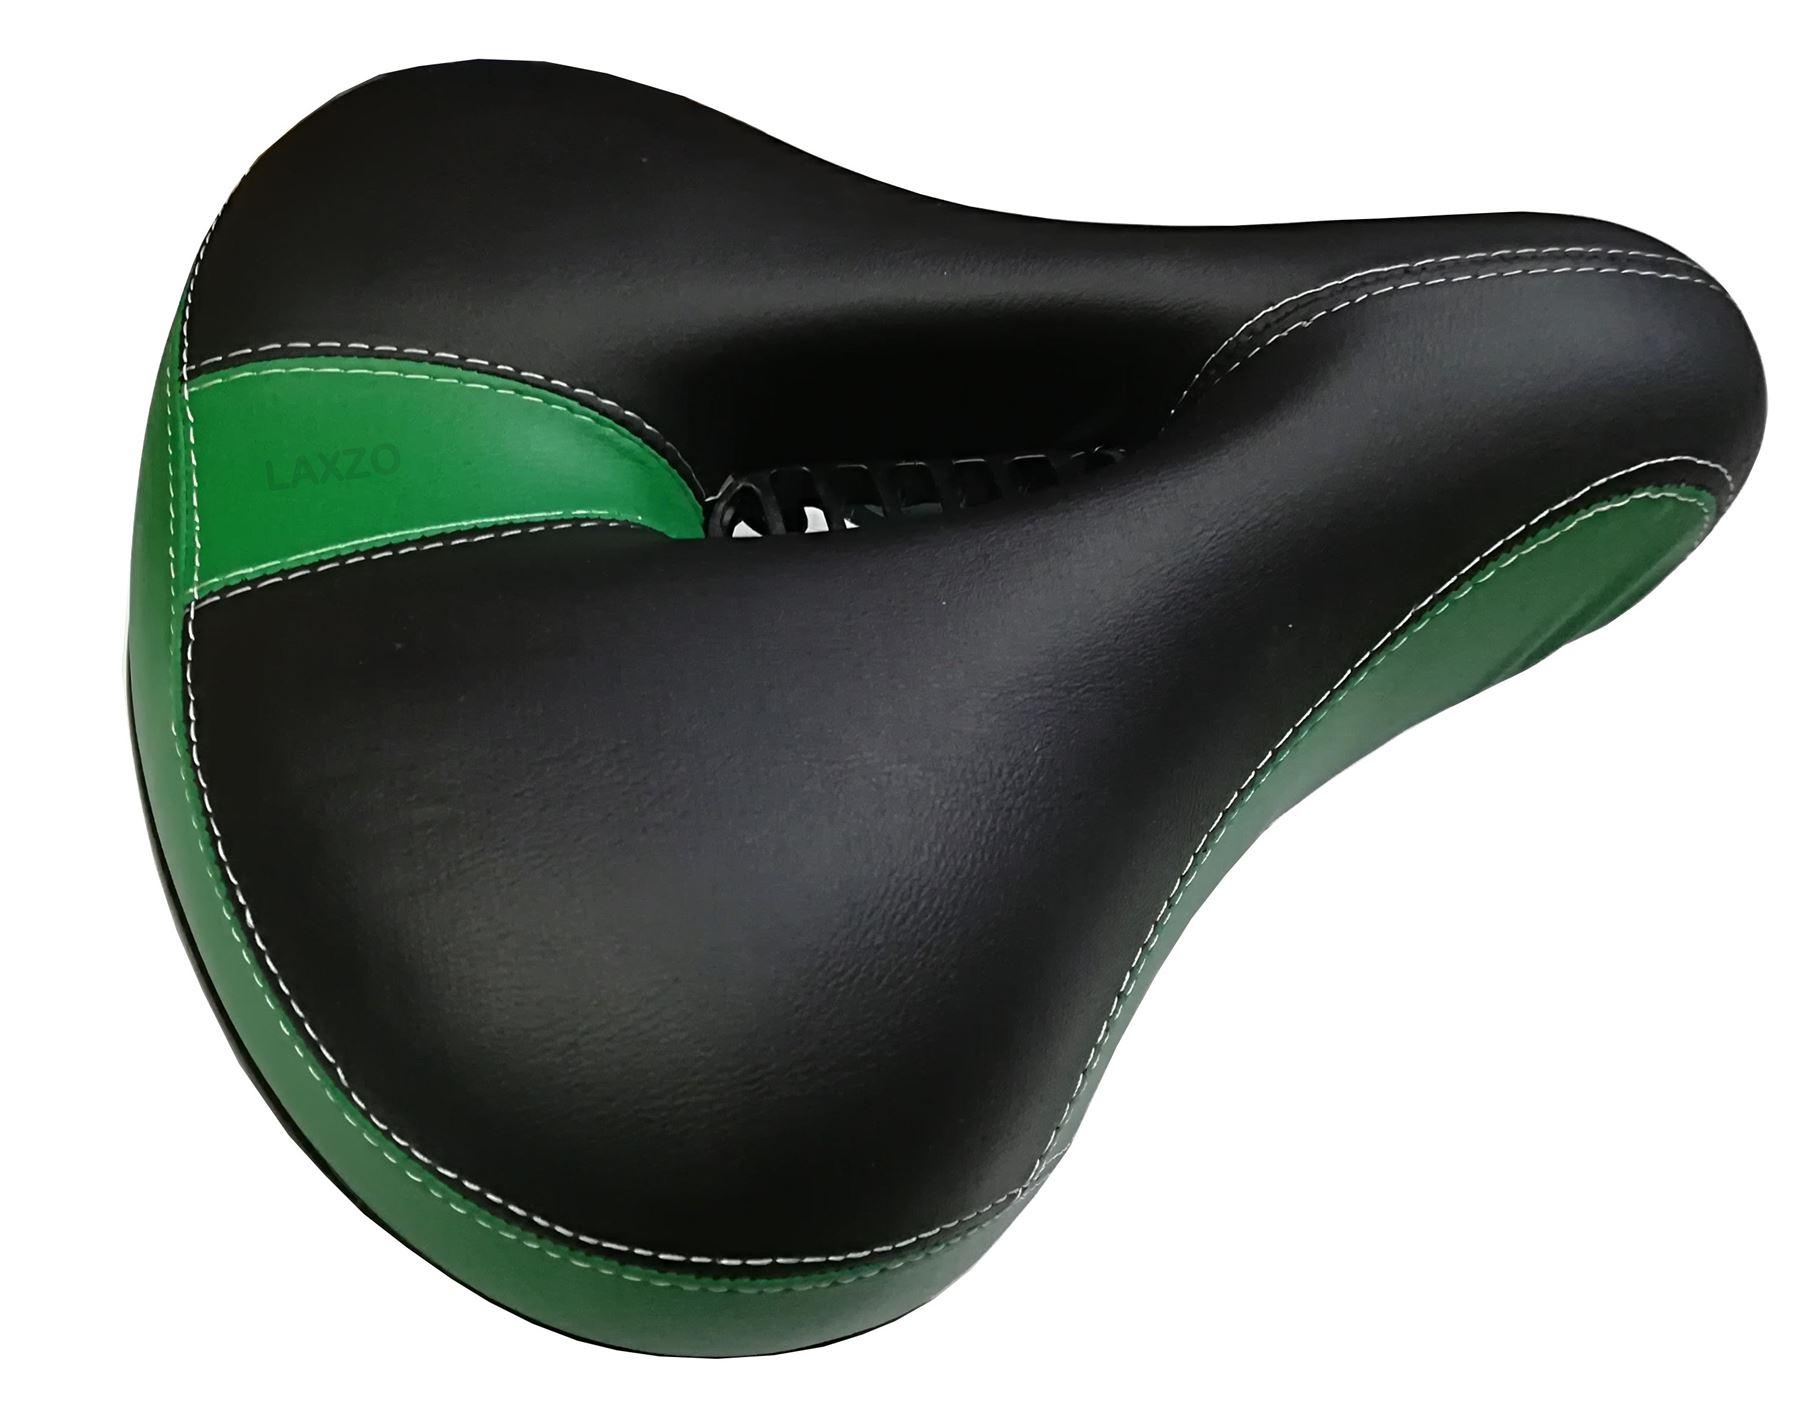 Dual-spring Bike Bicycle Cushion Wide Big Bum Extra Comfort Saddle Seat Pad New